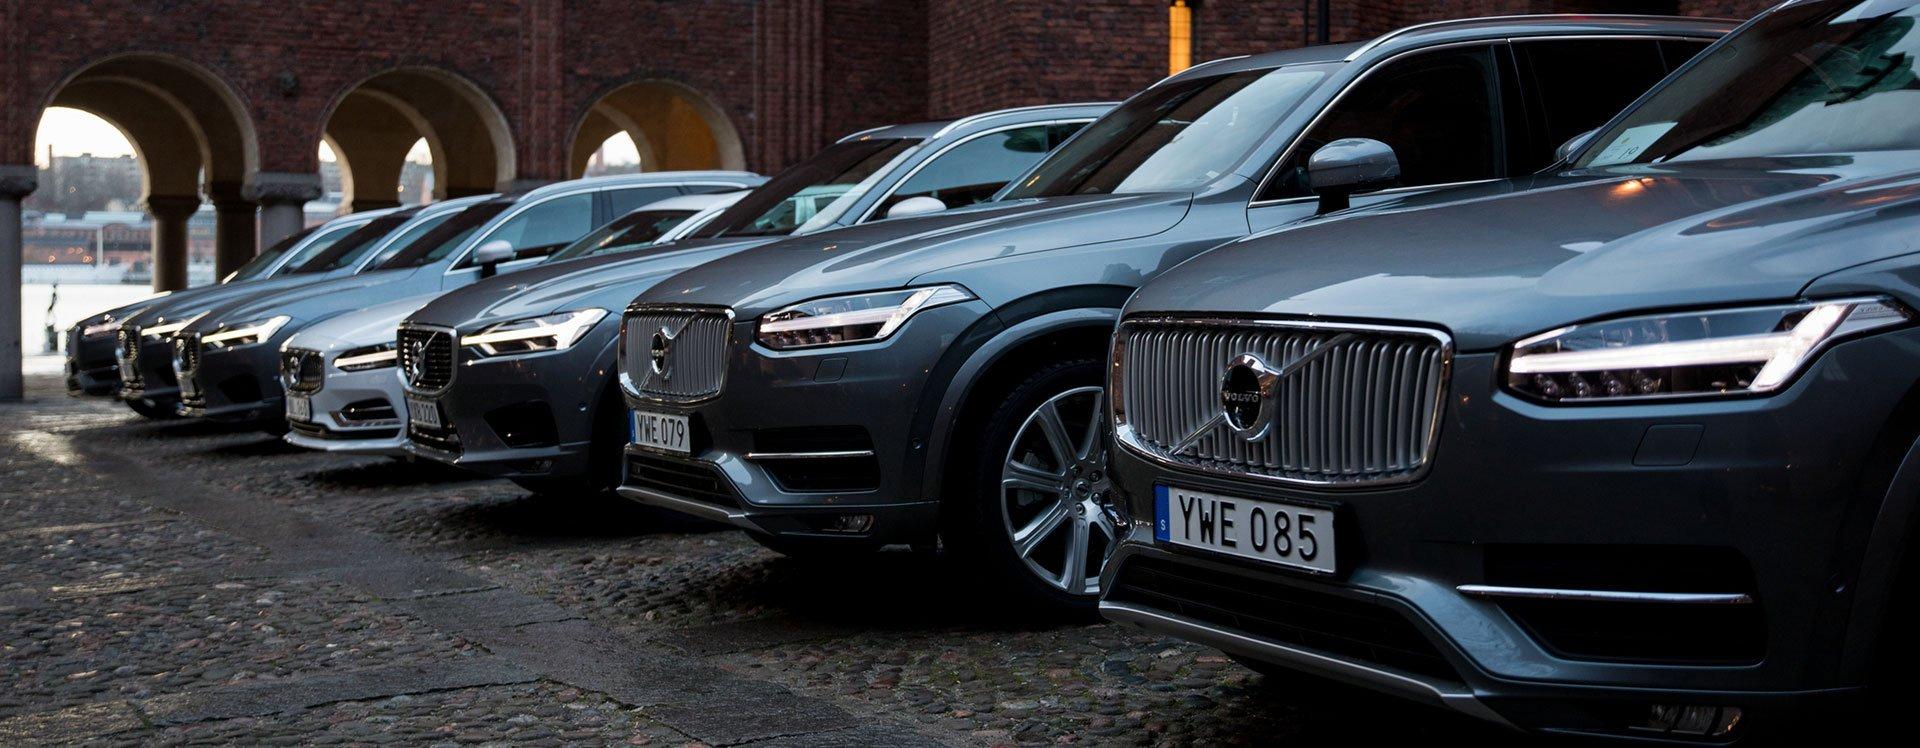 header-oferte-stoc-excellence-cars-volvo